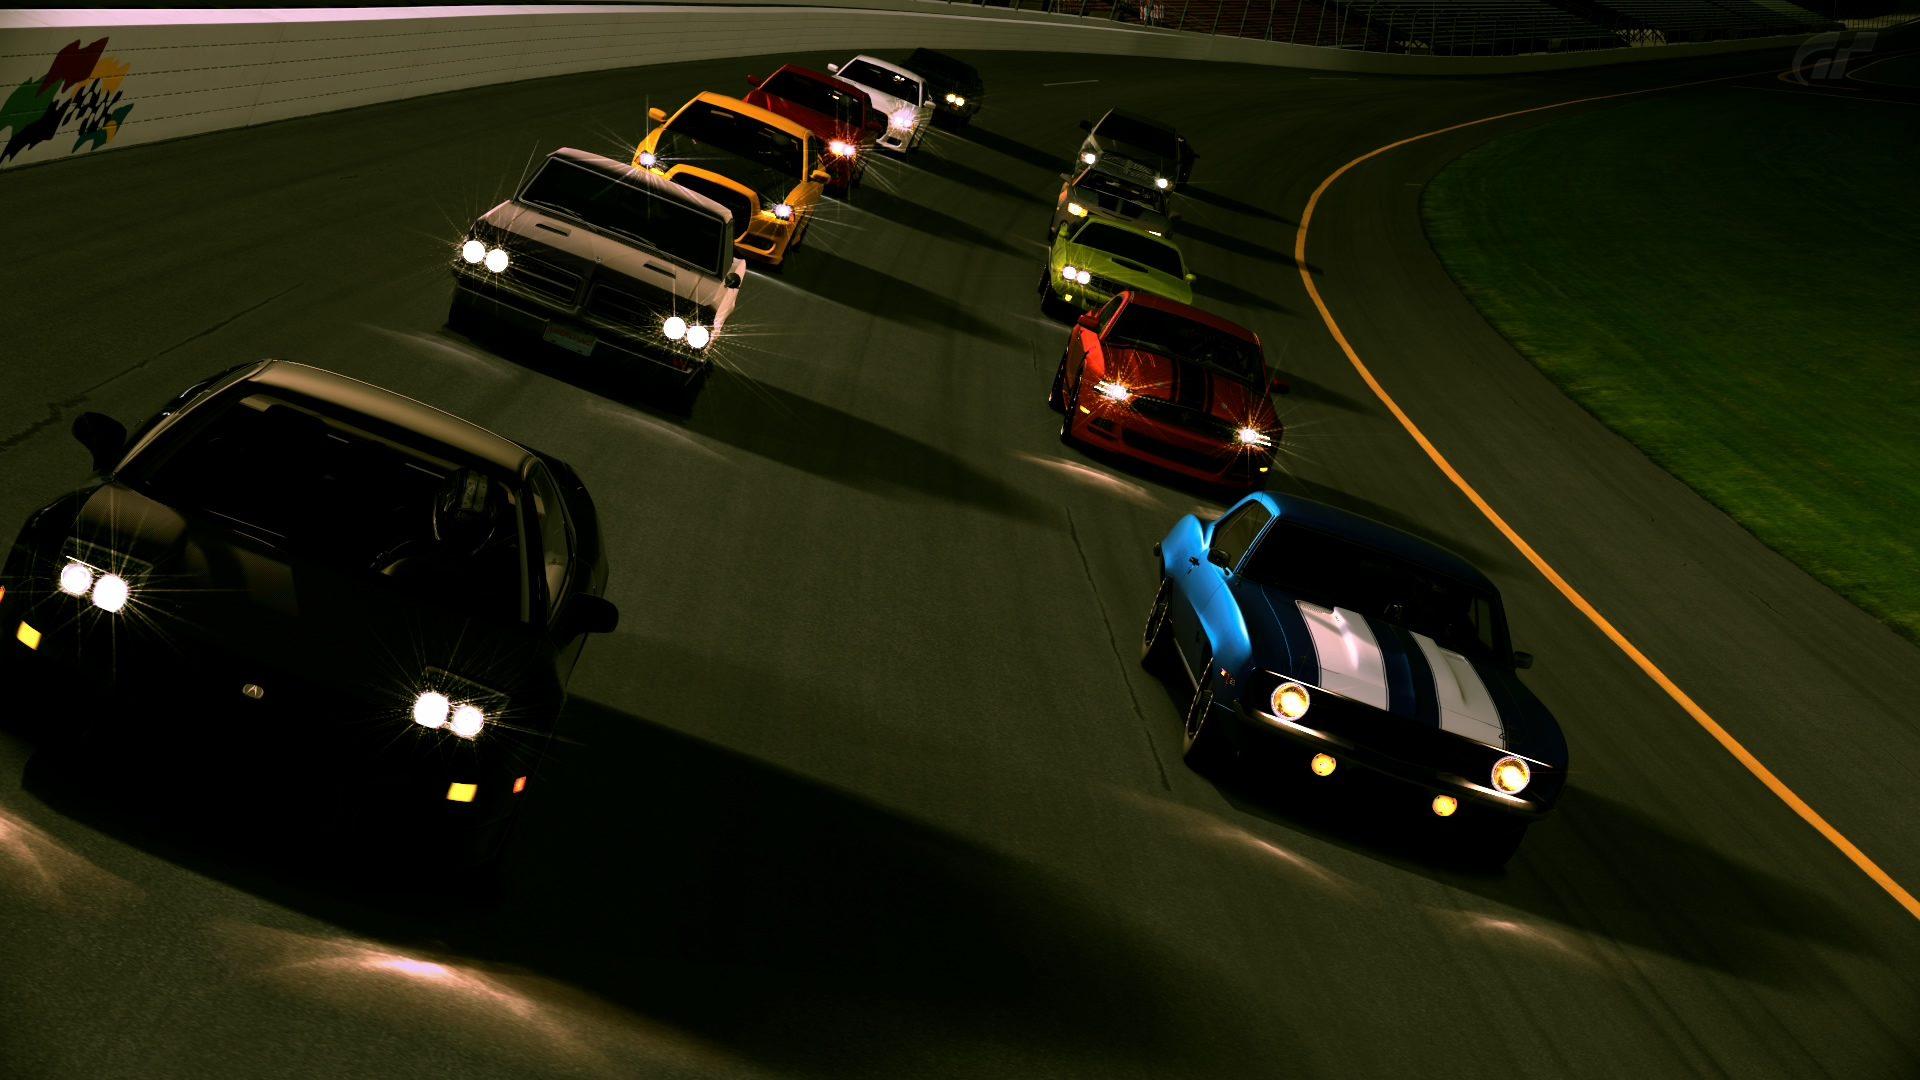 Percurso de estrada de Daytona_6.jpg